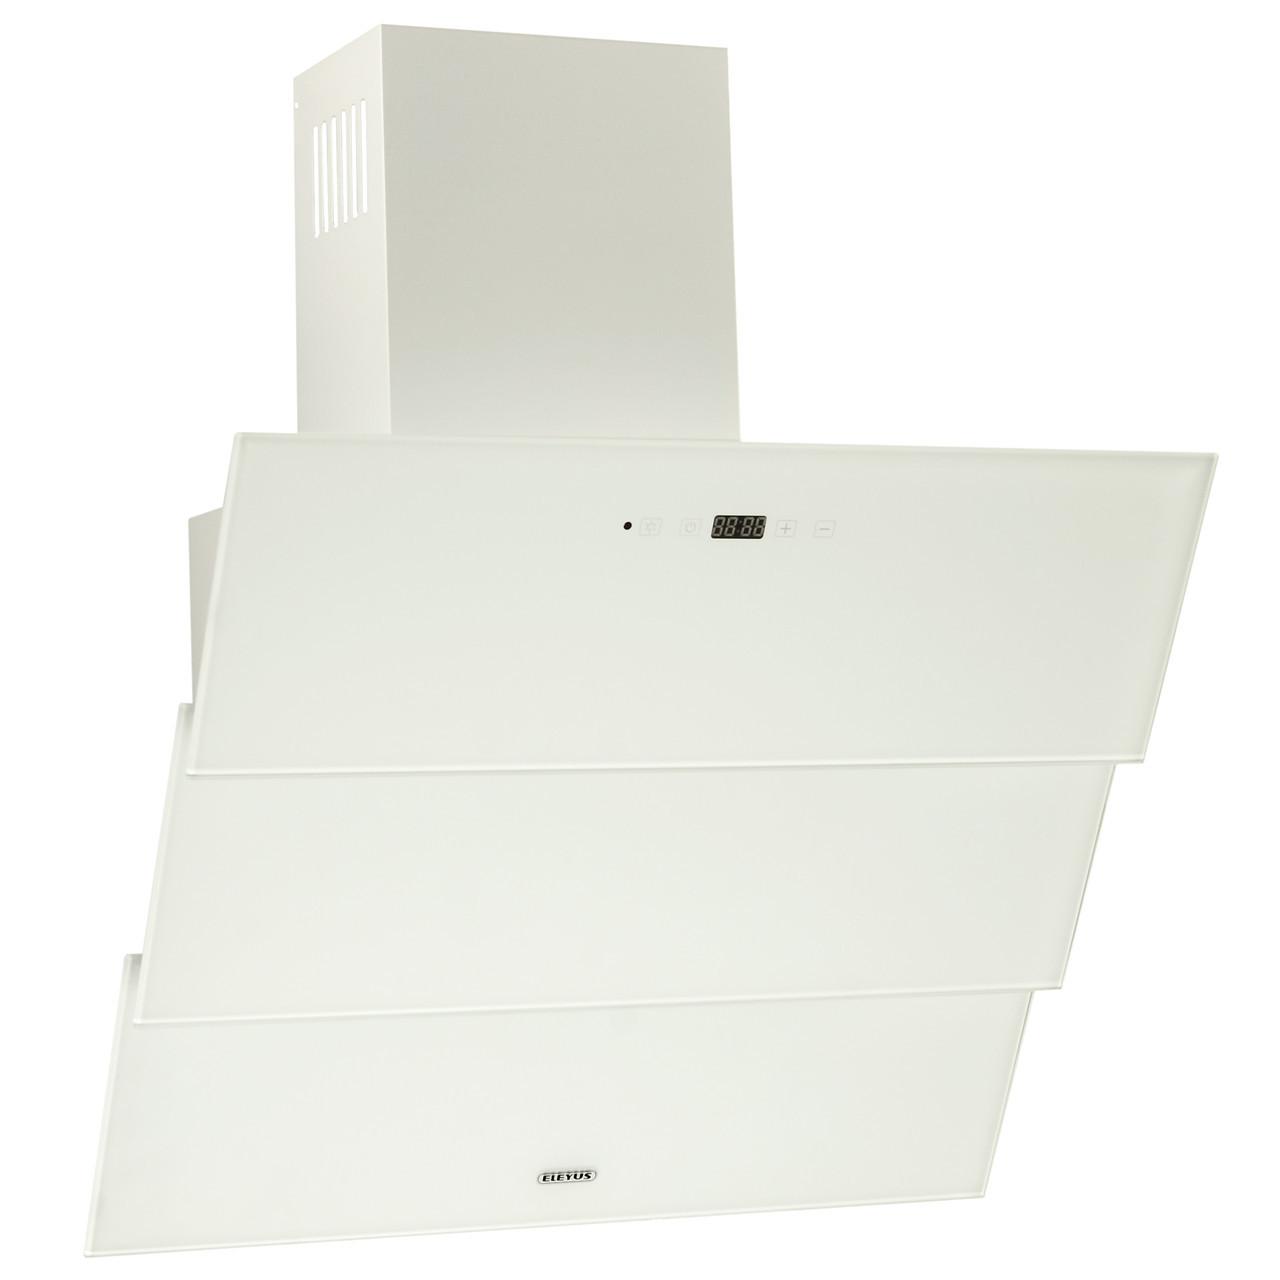 Витяжка кухонна вертикальна ELEYUS Troy 1200 LED SMD 60 WH + Безкоштовна доставка!